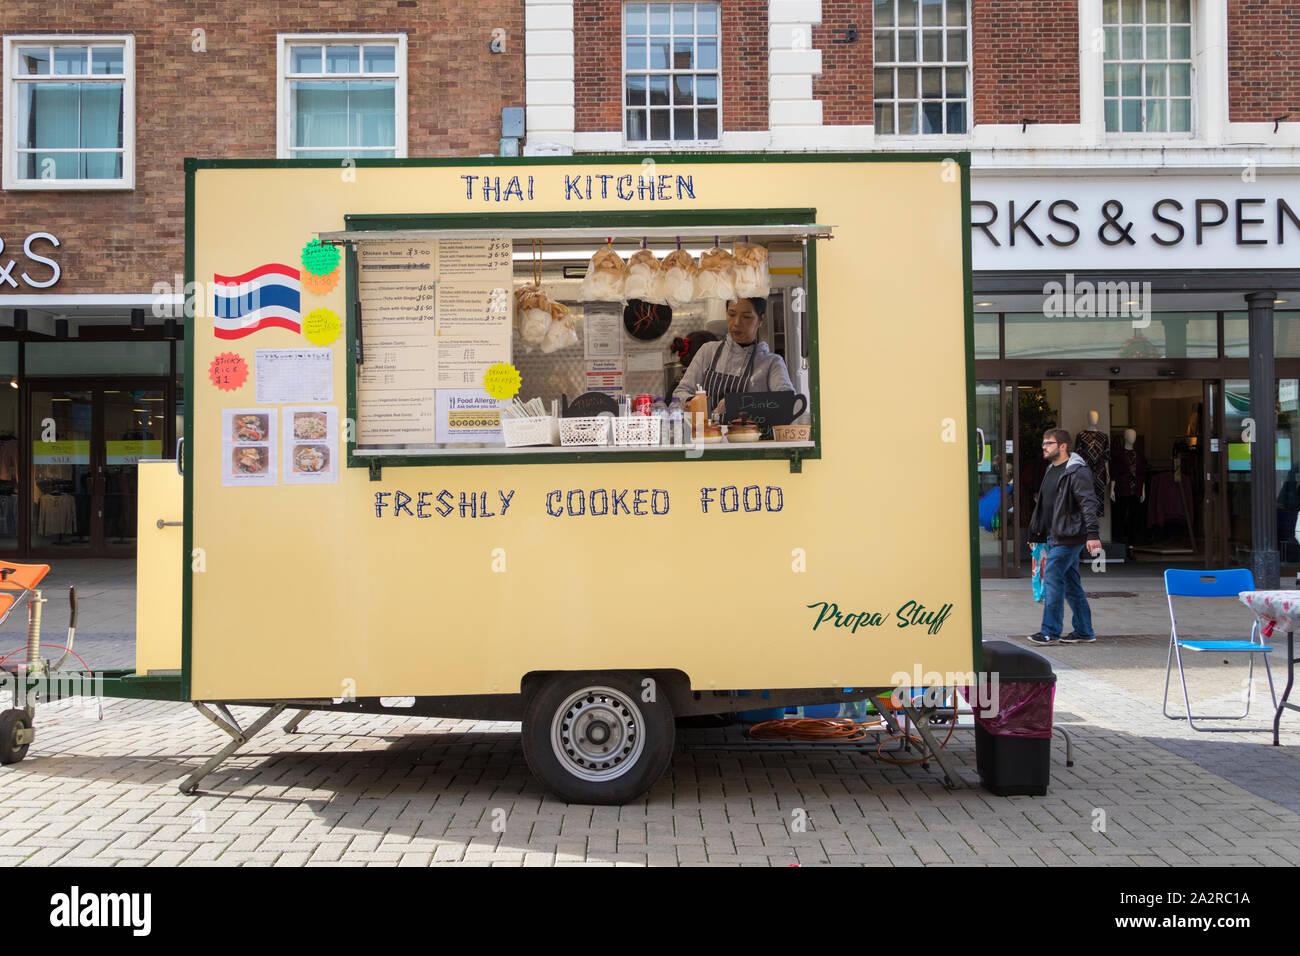 Street Food Vendor Thai Kitchen Canterbury Kent Uk Stock Photo Alamy